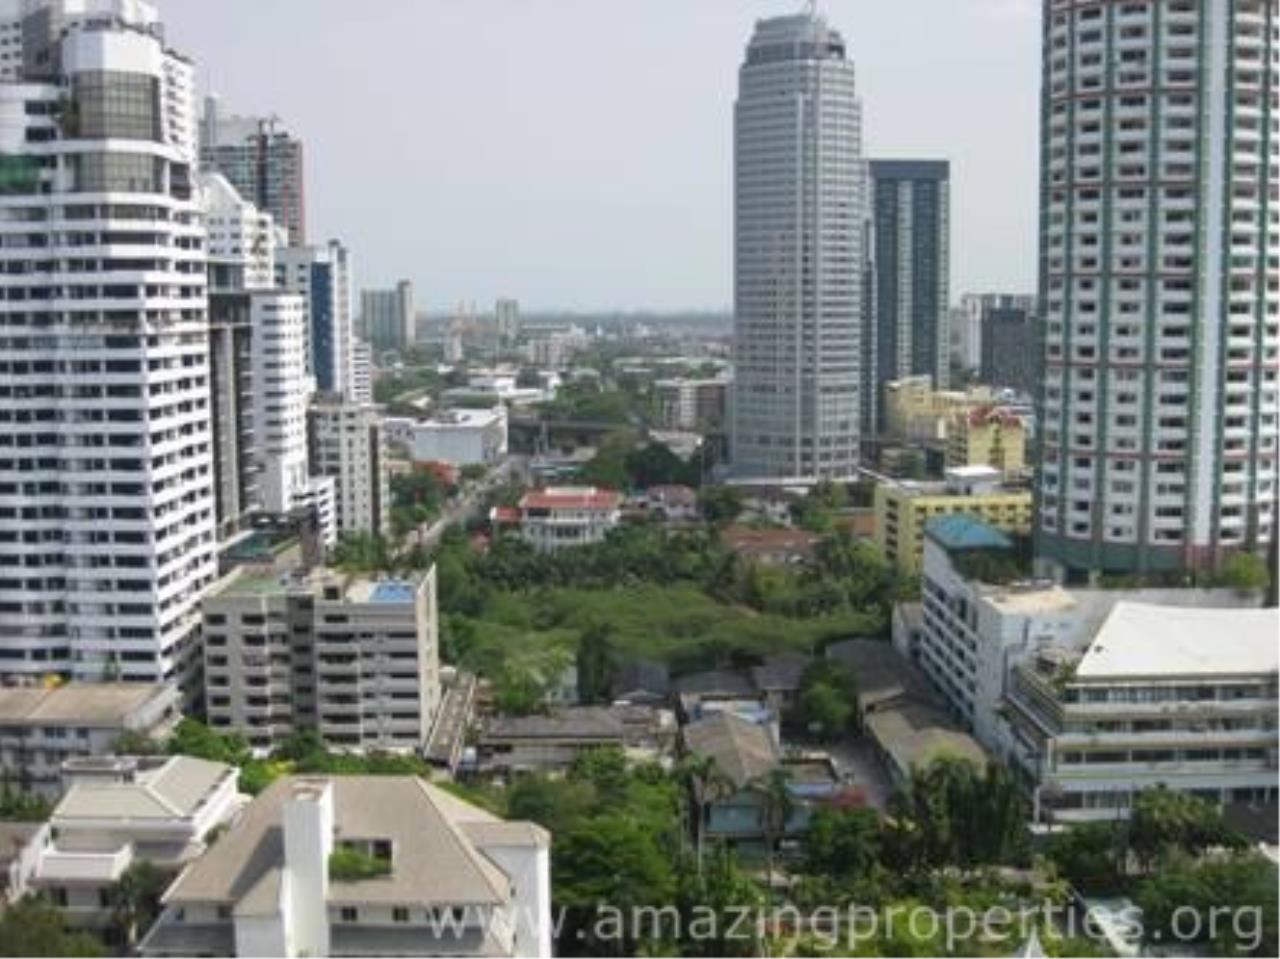 Amazing Properties Agency's 1 bedroom Apartment for rent 5